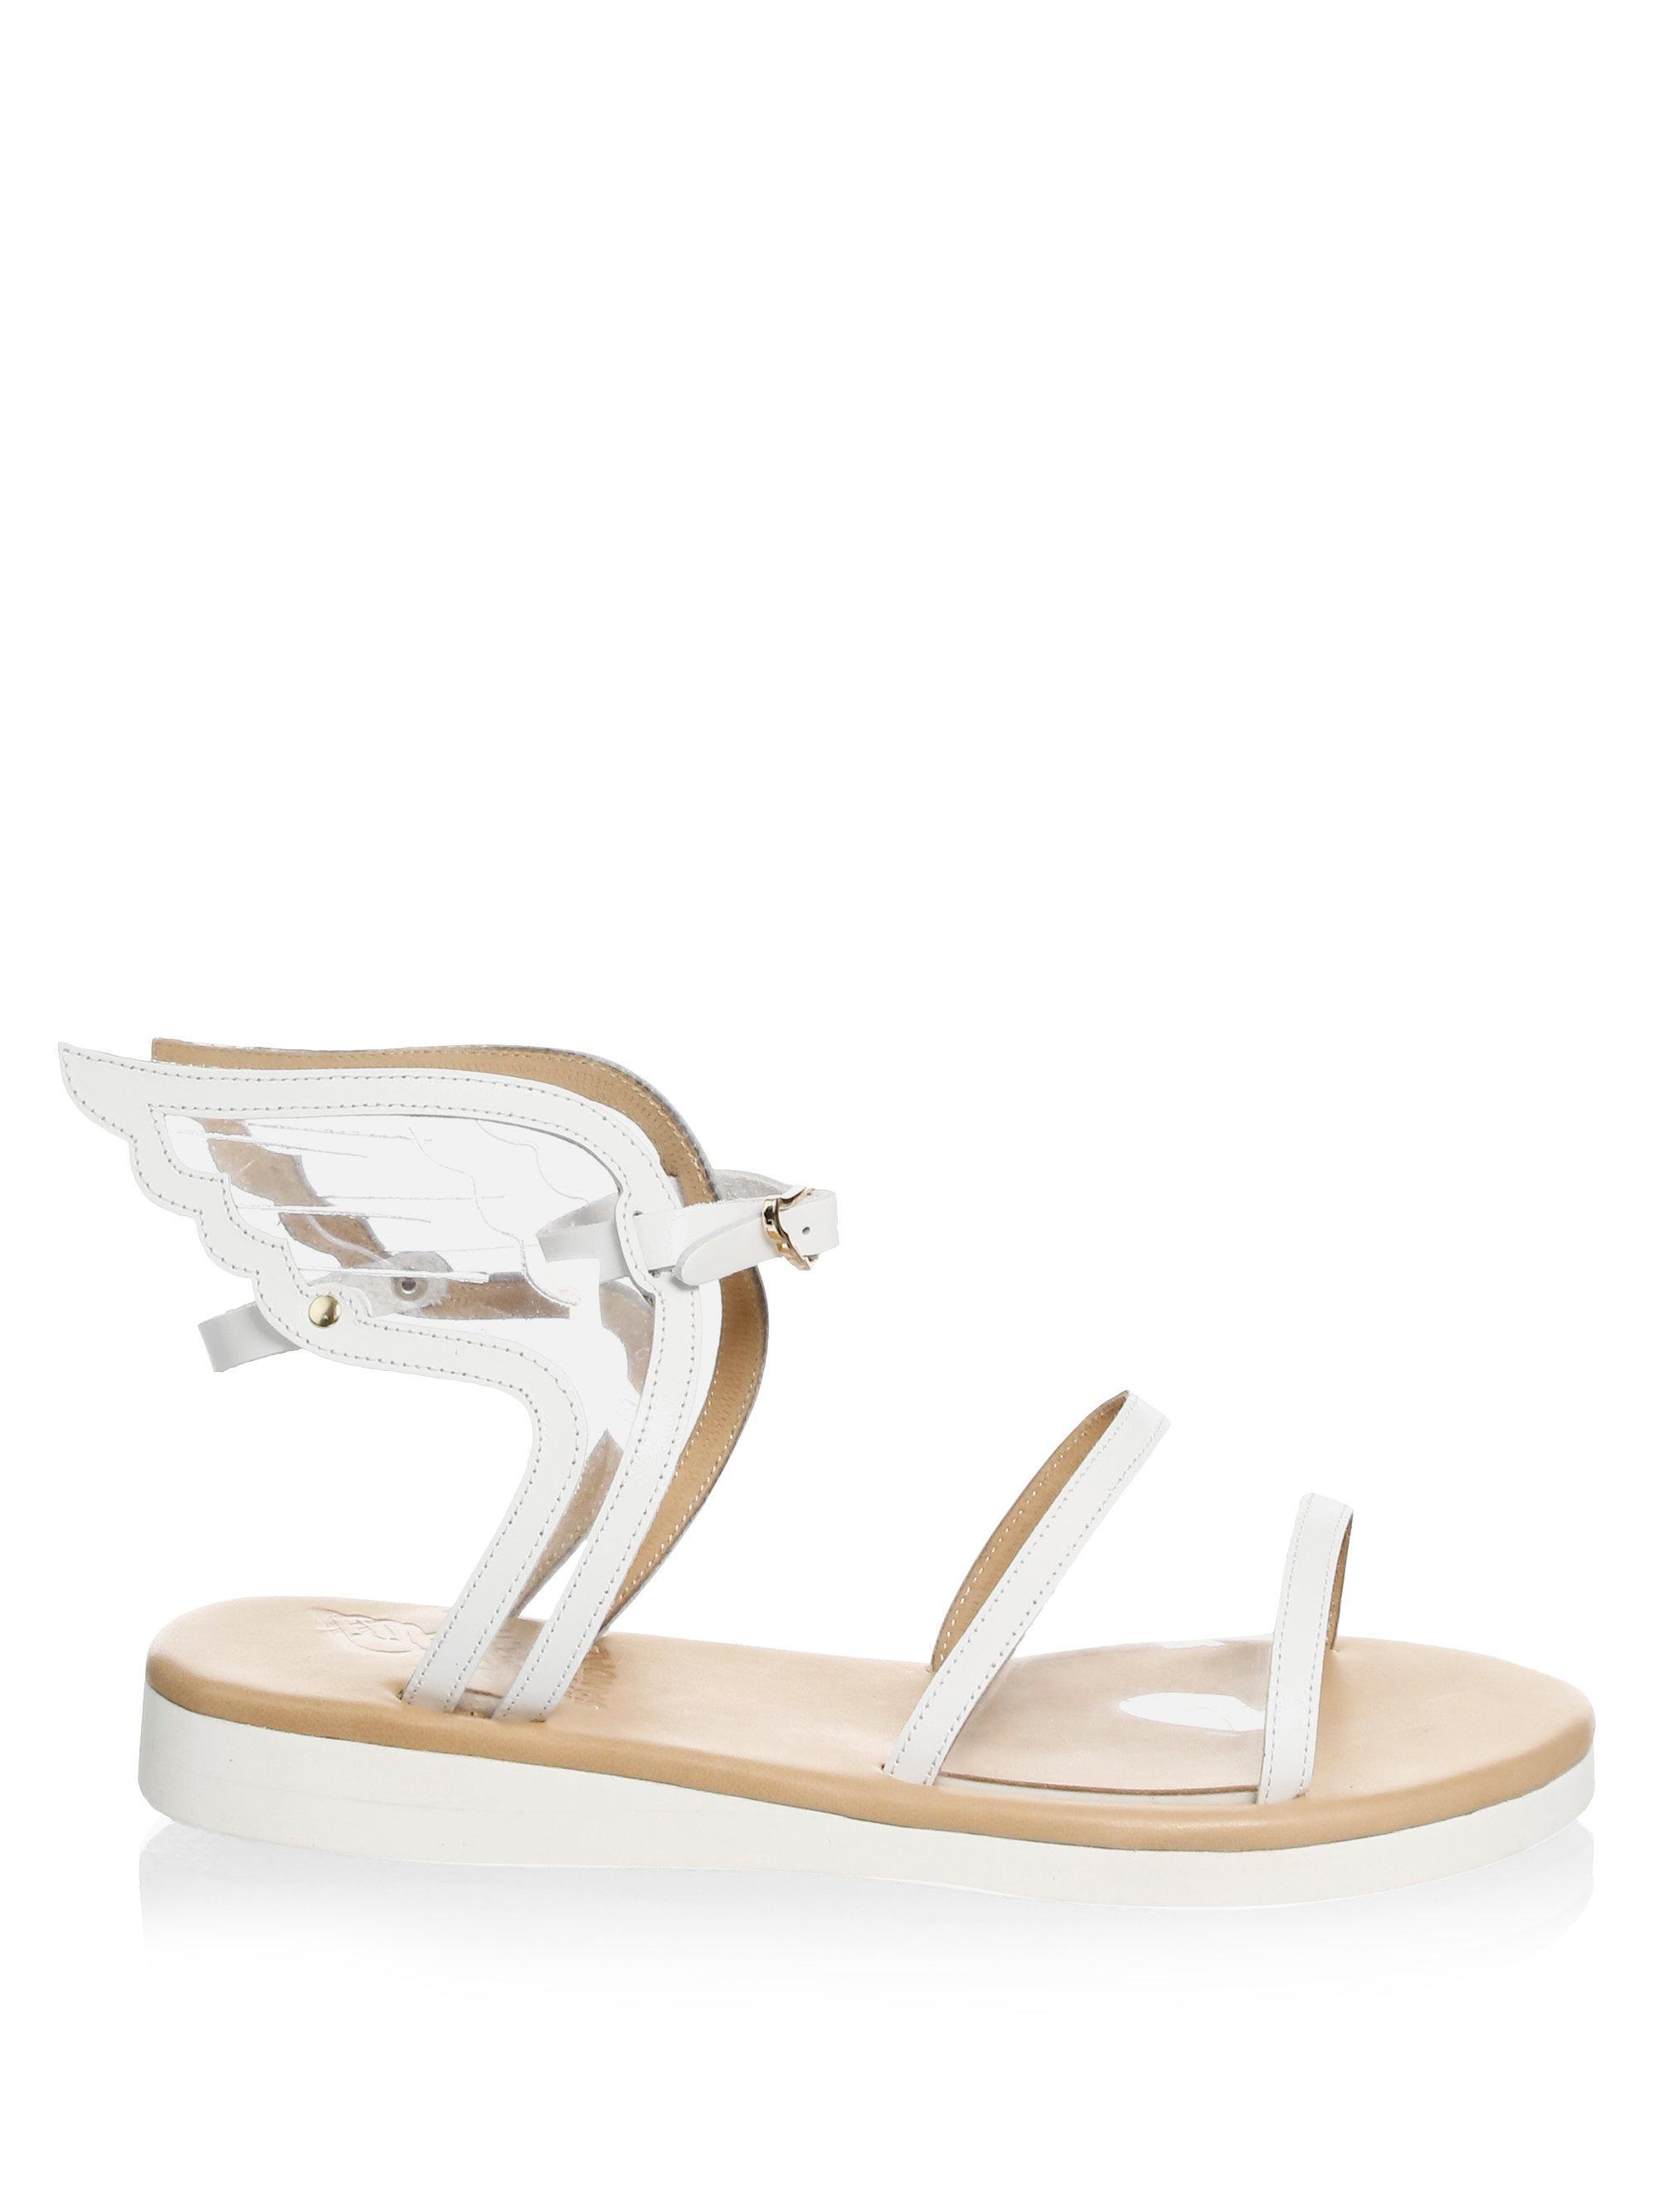 Ancient Greek Sandals Fun Ikaria Leather Gladiator Sandals txhpSEn